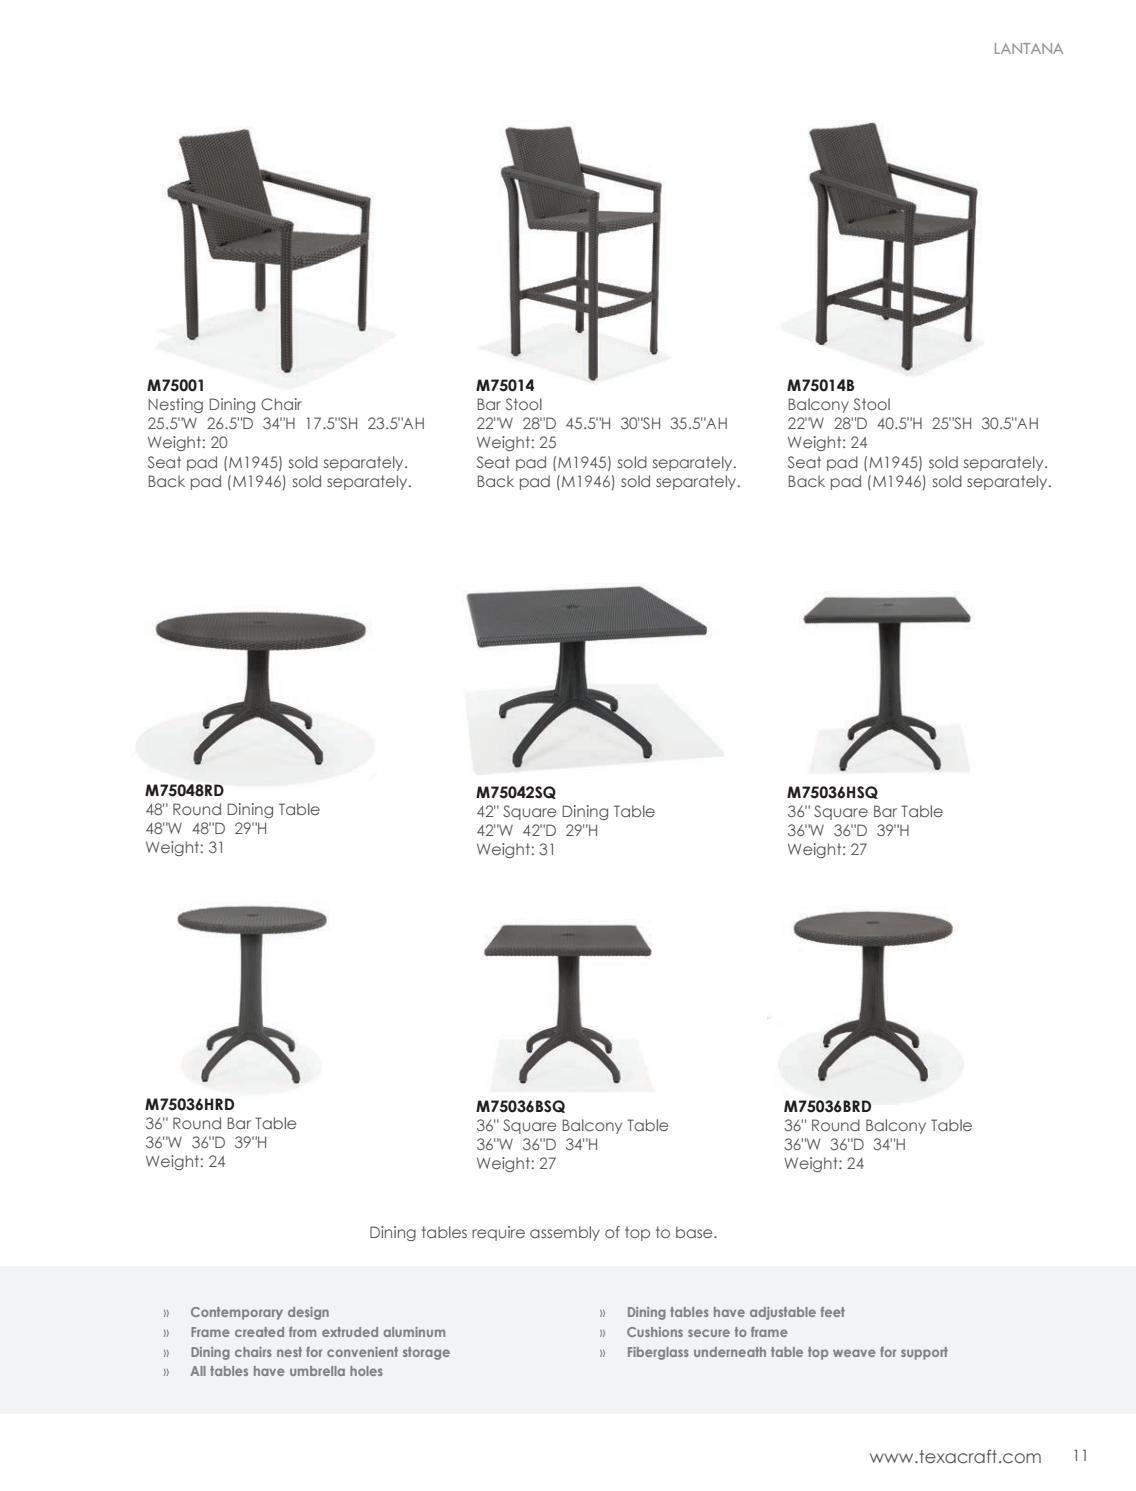 Phenomenal 2018 Texacraft Catalog By Winston Furniture Issuu Machost Co Dining Chair Design Ideas Machostcouk